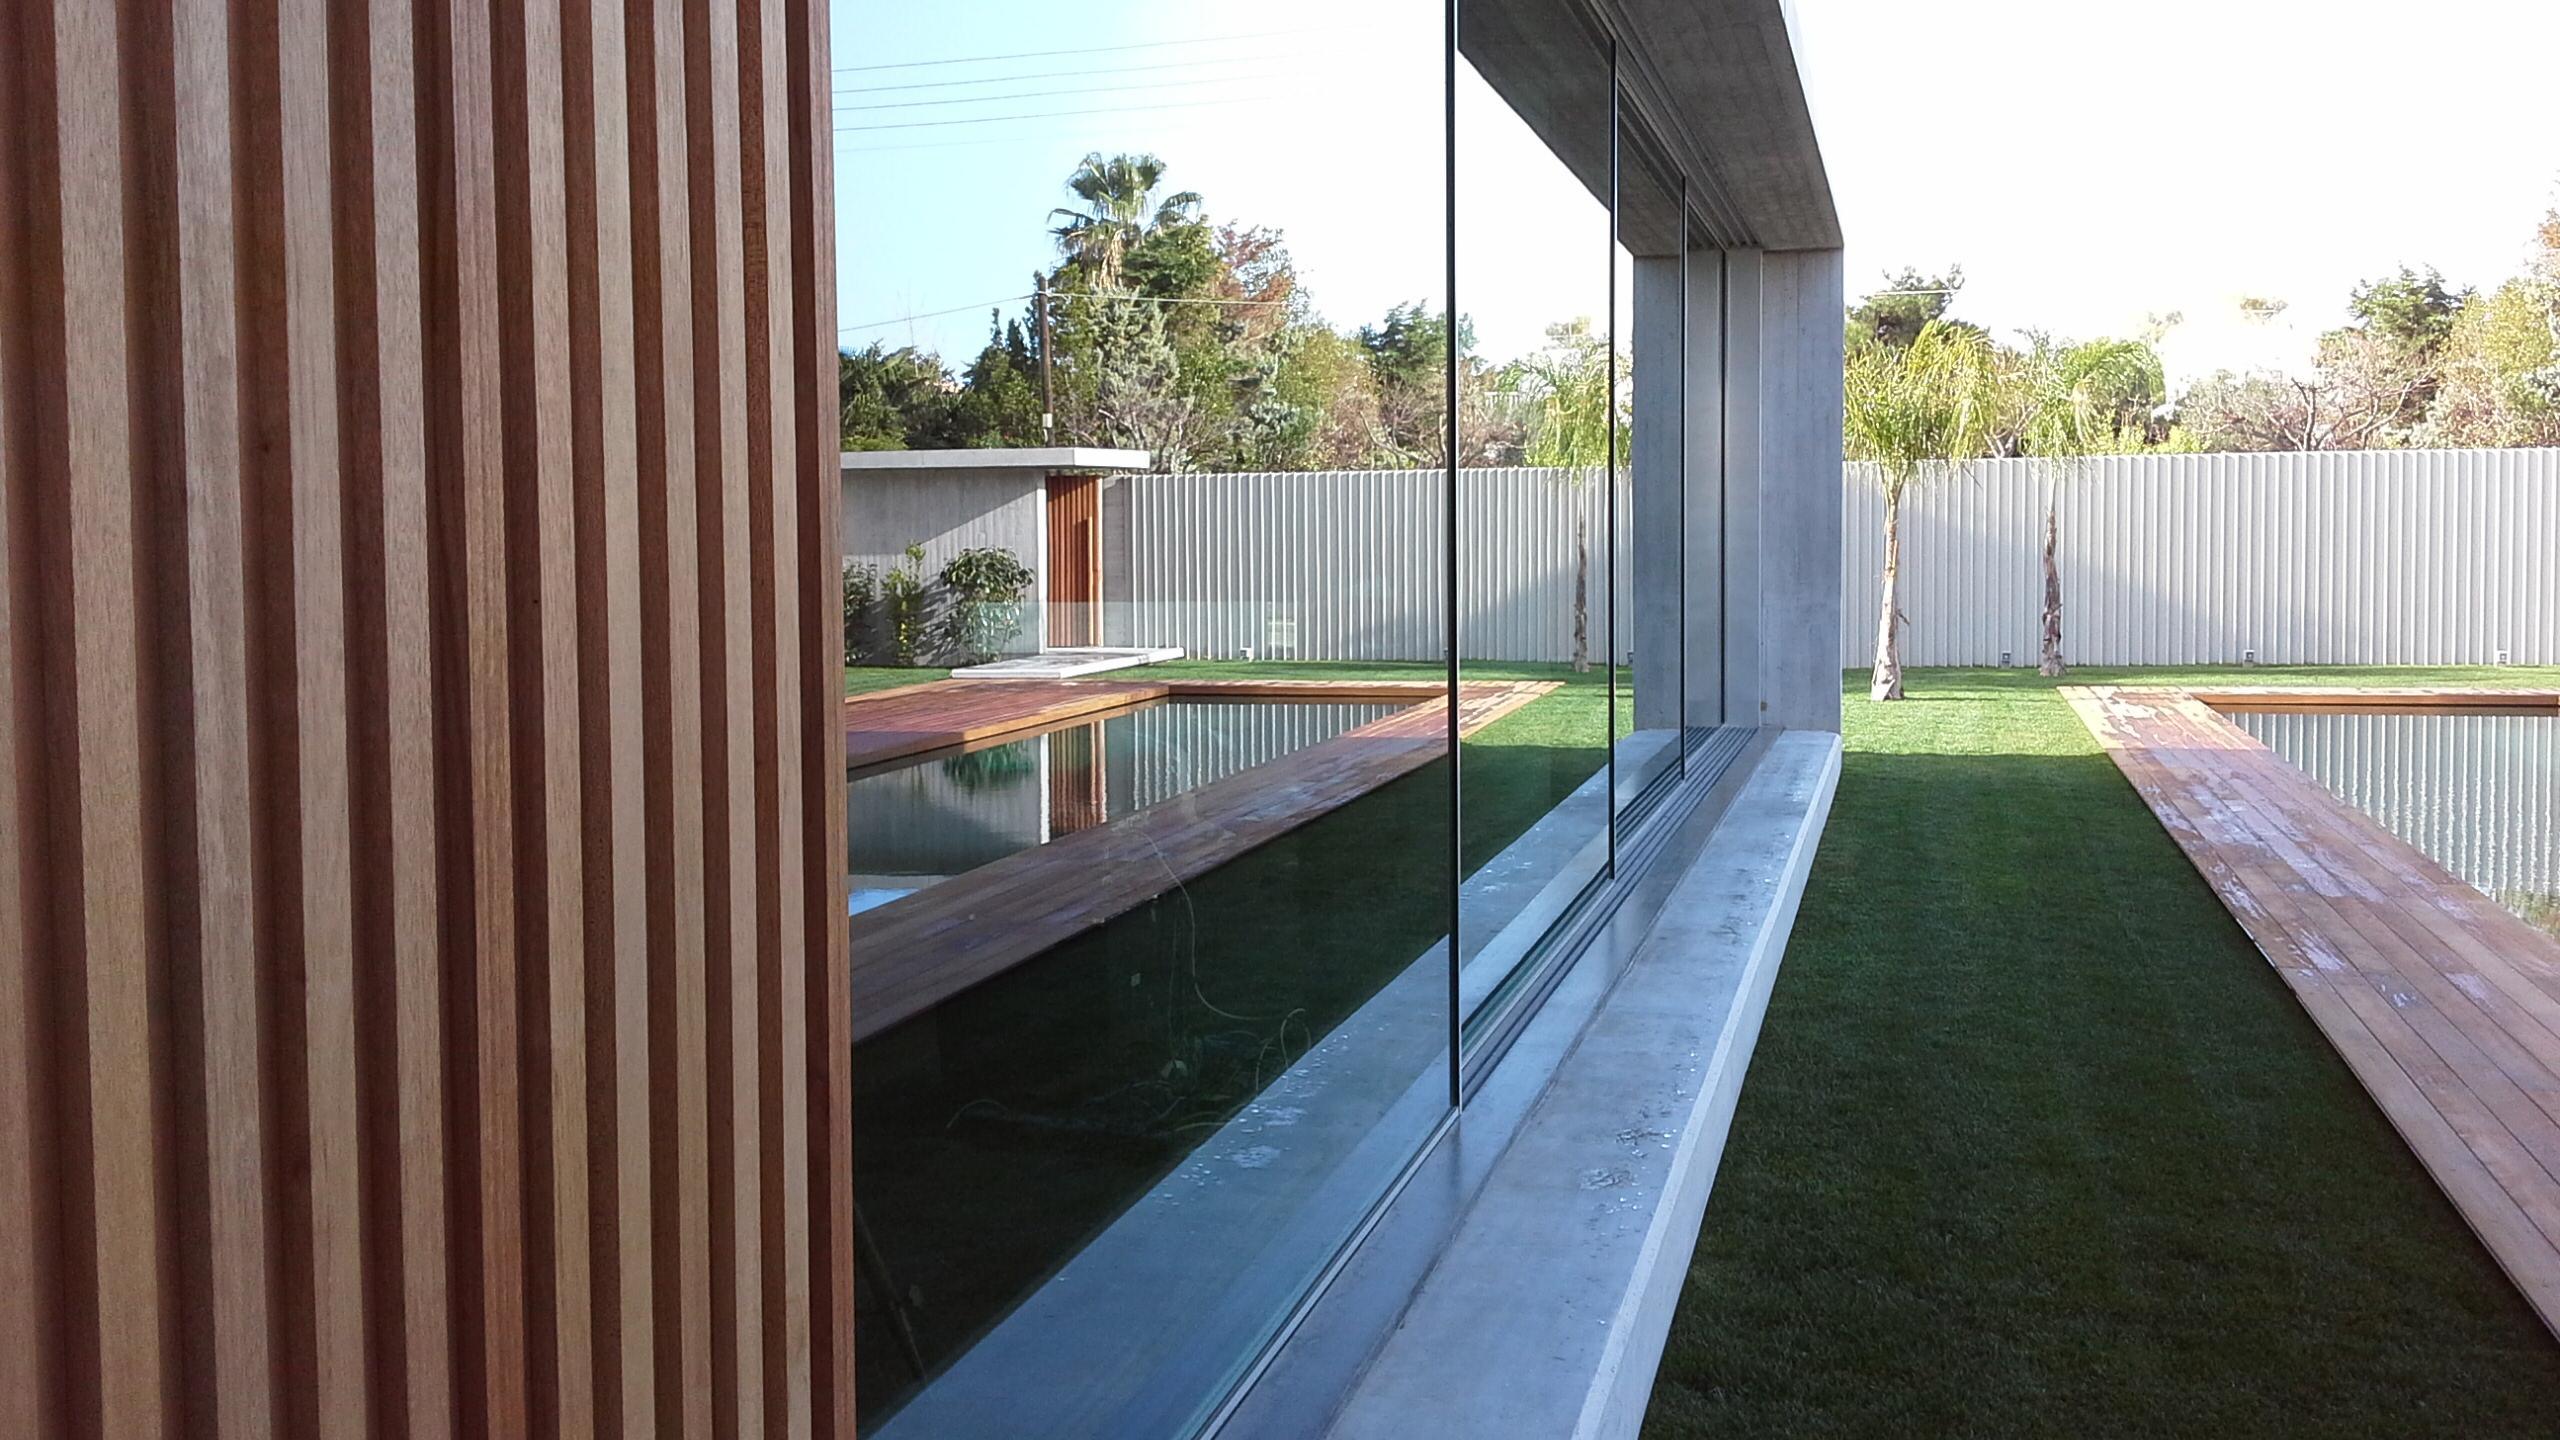 Sias-Projects-Design-Team-Nikos-Theodorakopoulos-Residence-in-Attika-06